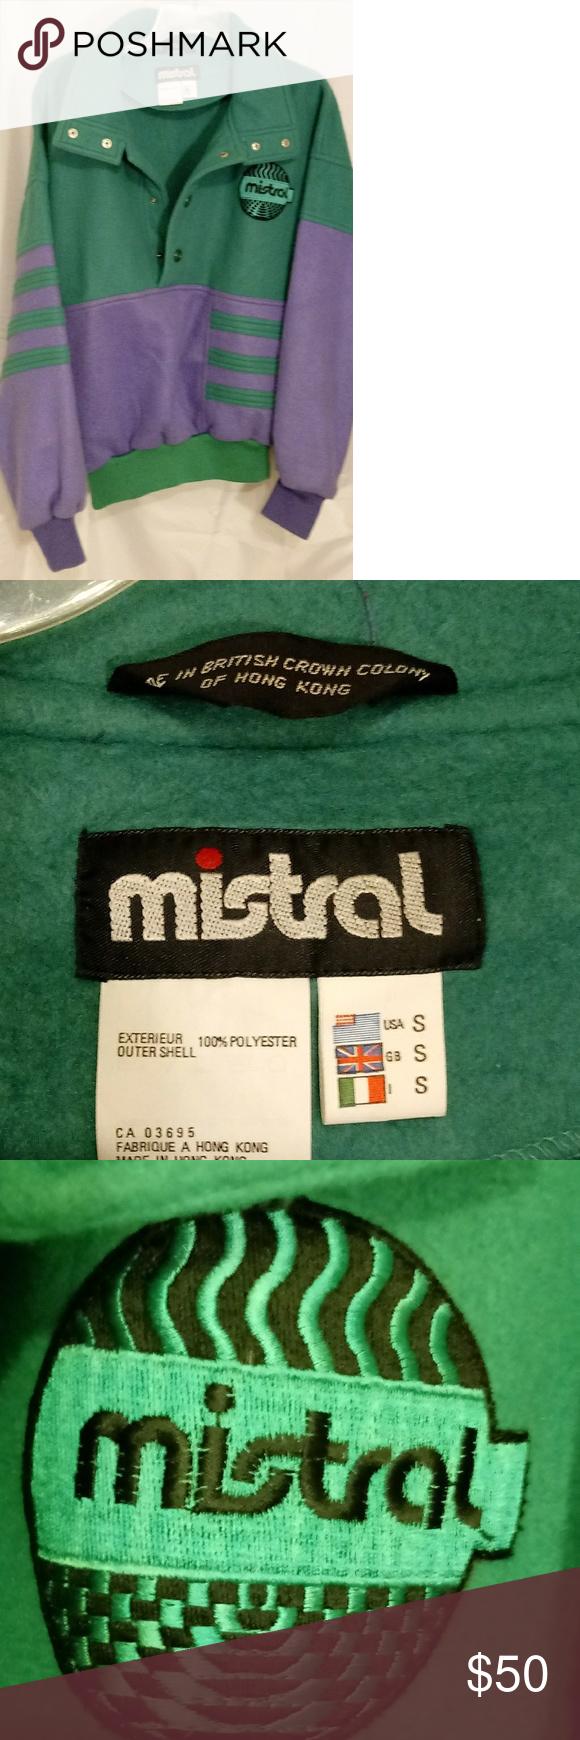 Mistral womens vintage s s fleece jacket small pinterest